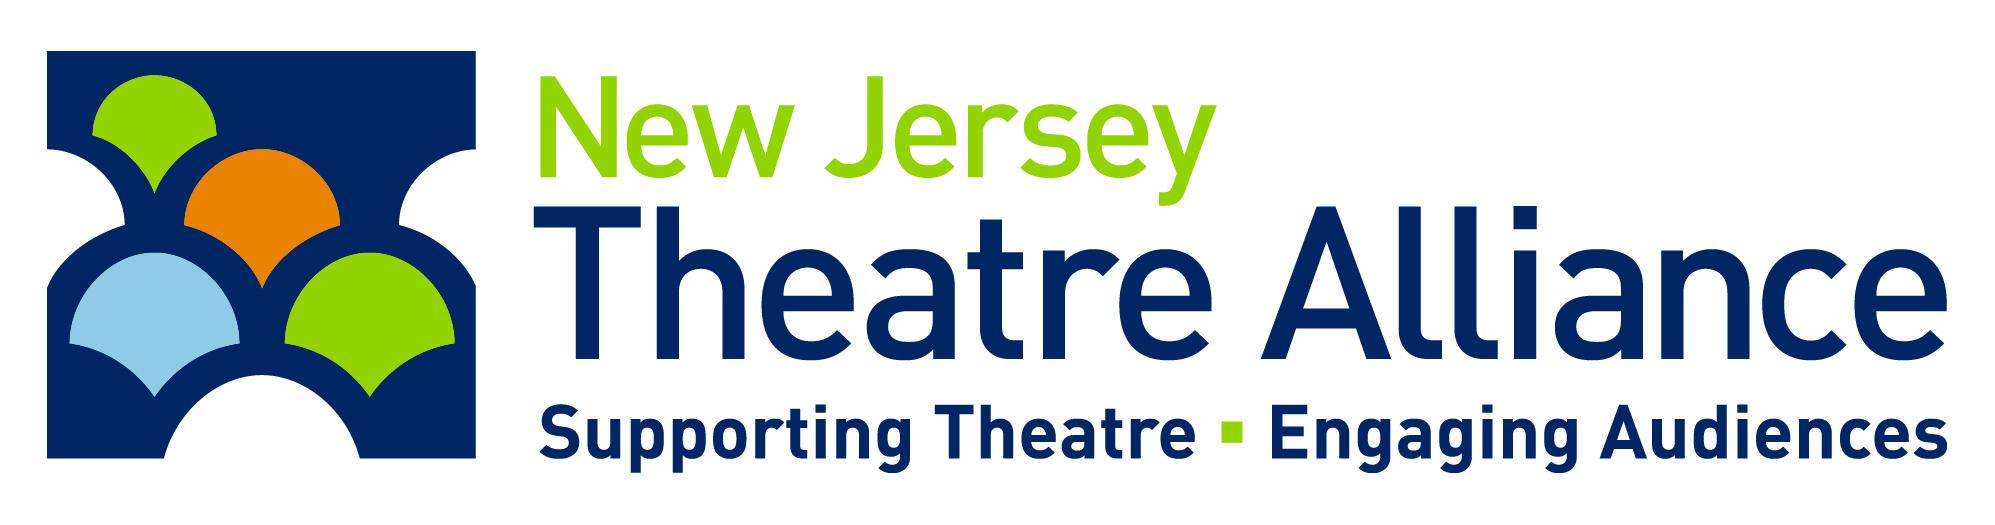 New Jersey Theatre Alliance Logo